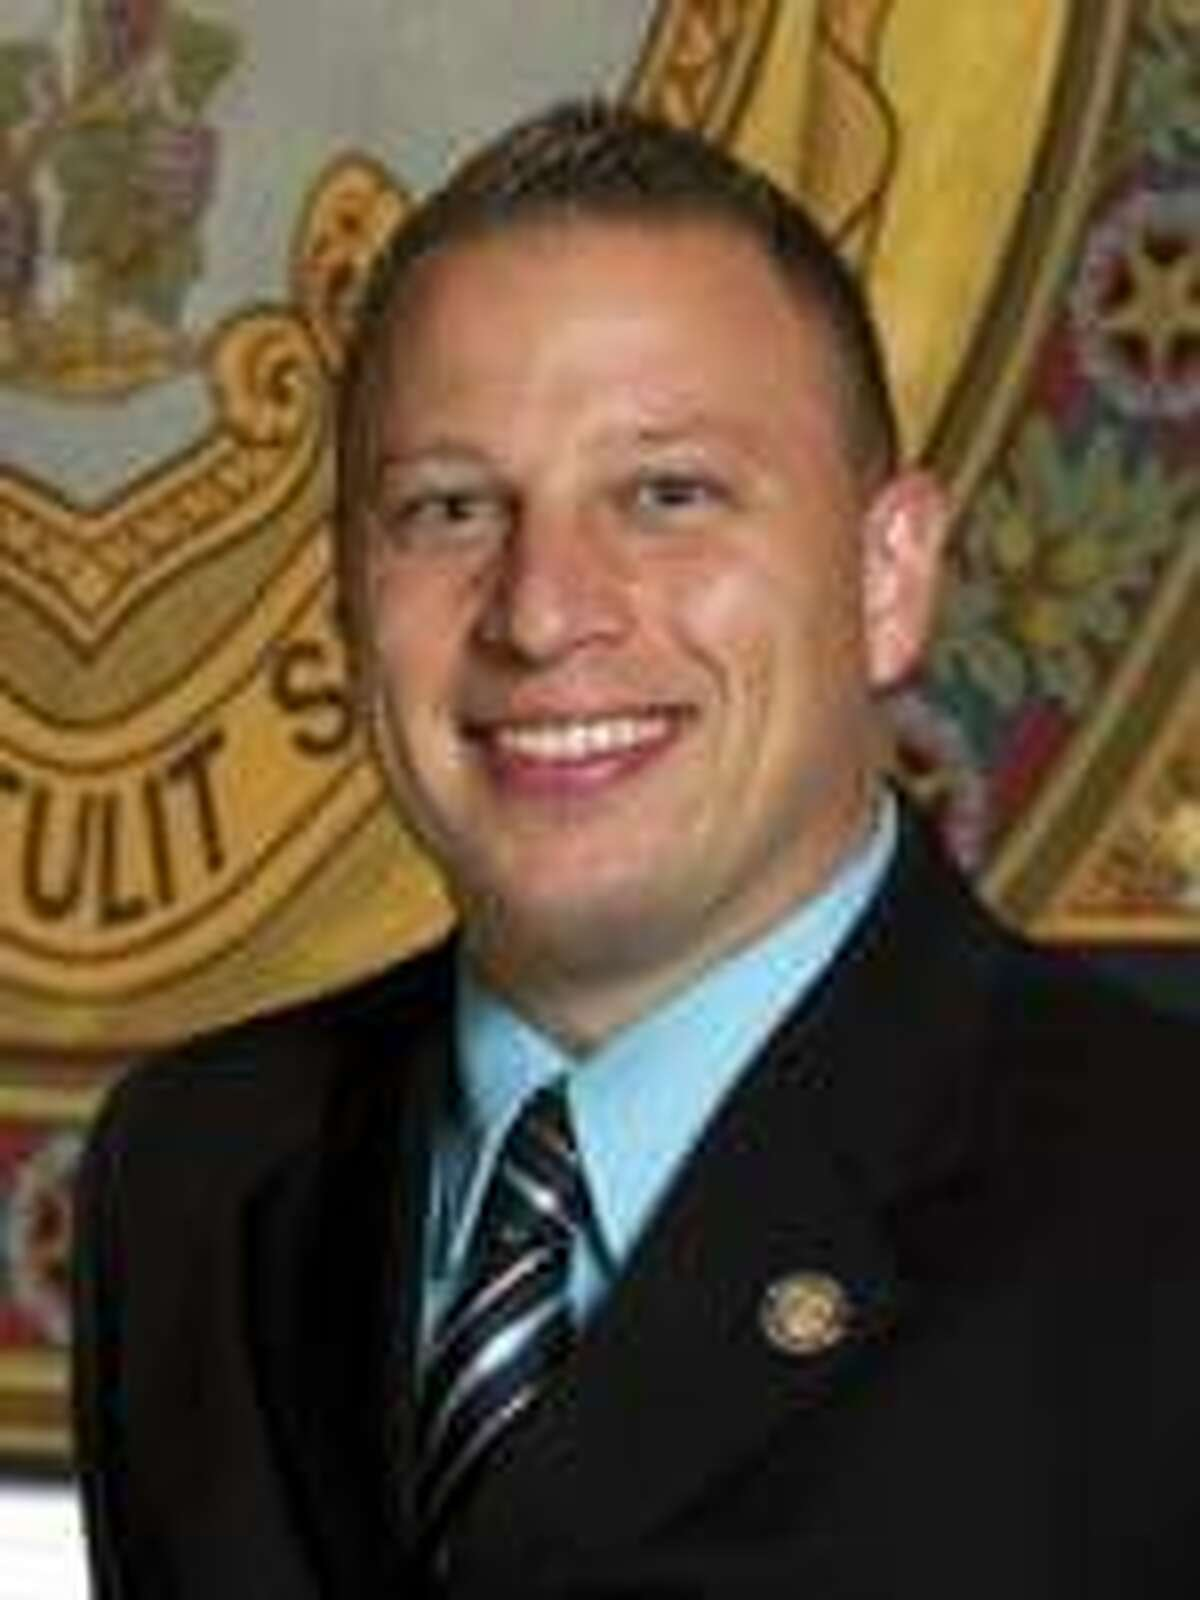 State Sen. Rob Sampson, R-Wolcott